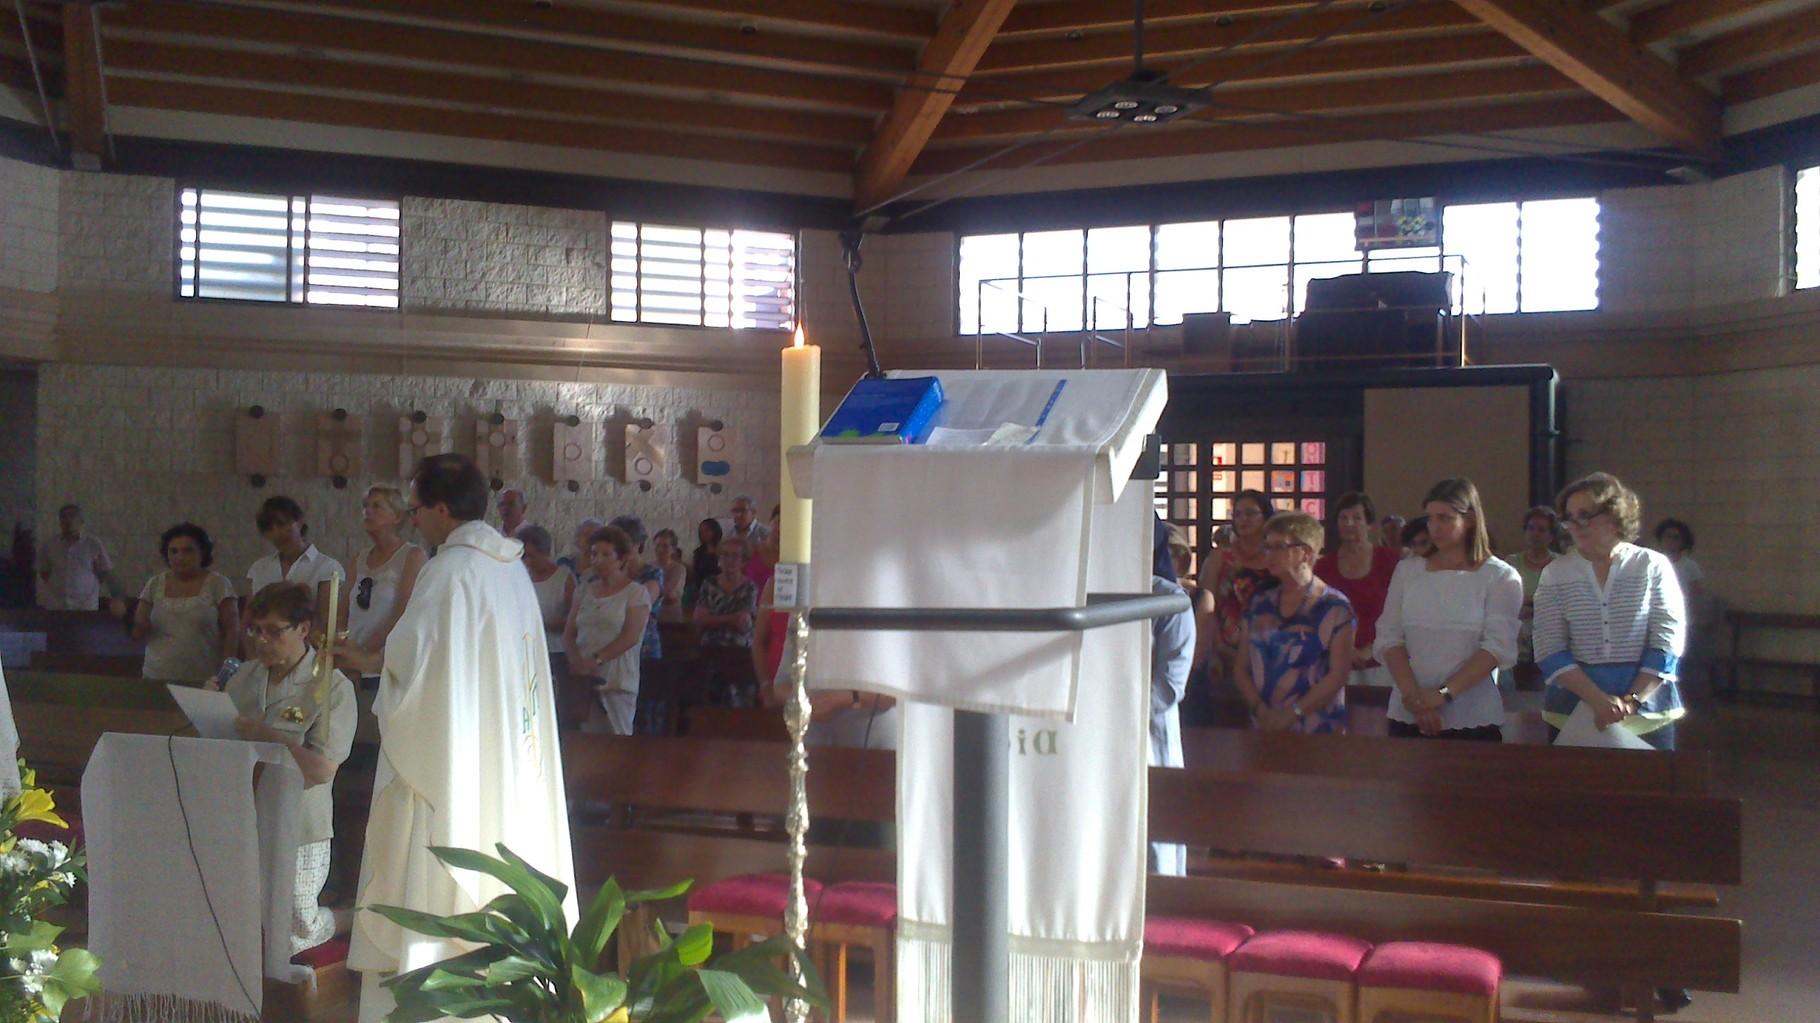 50 aniversario como religiosa de Ana María - 6 de Julio de 2015